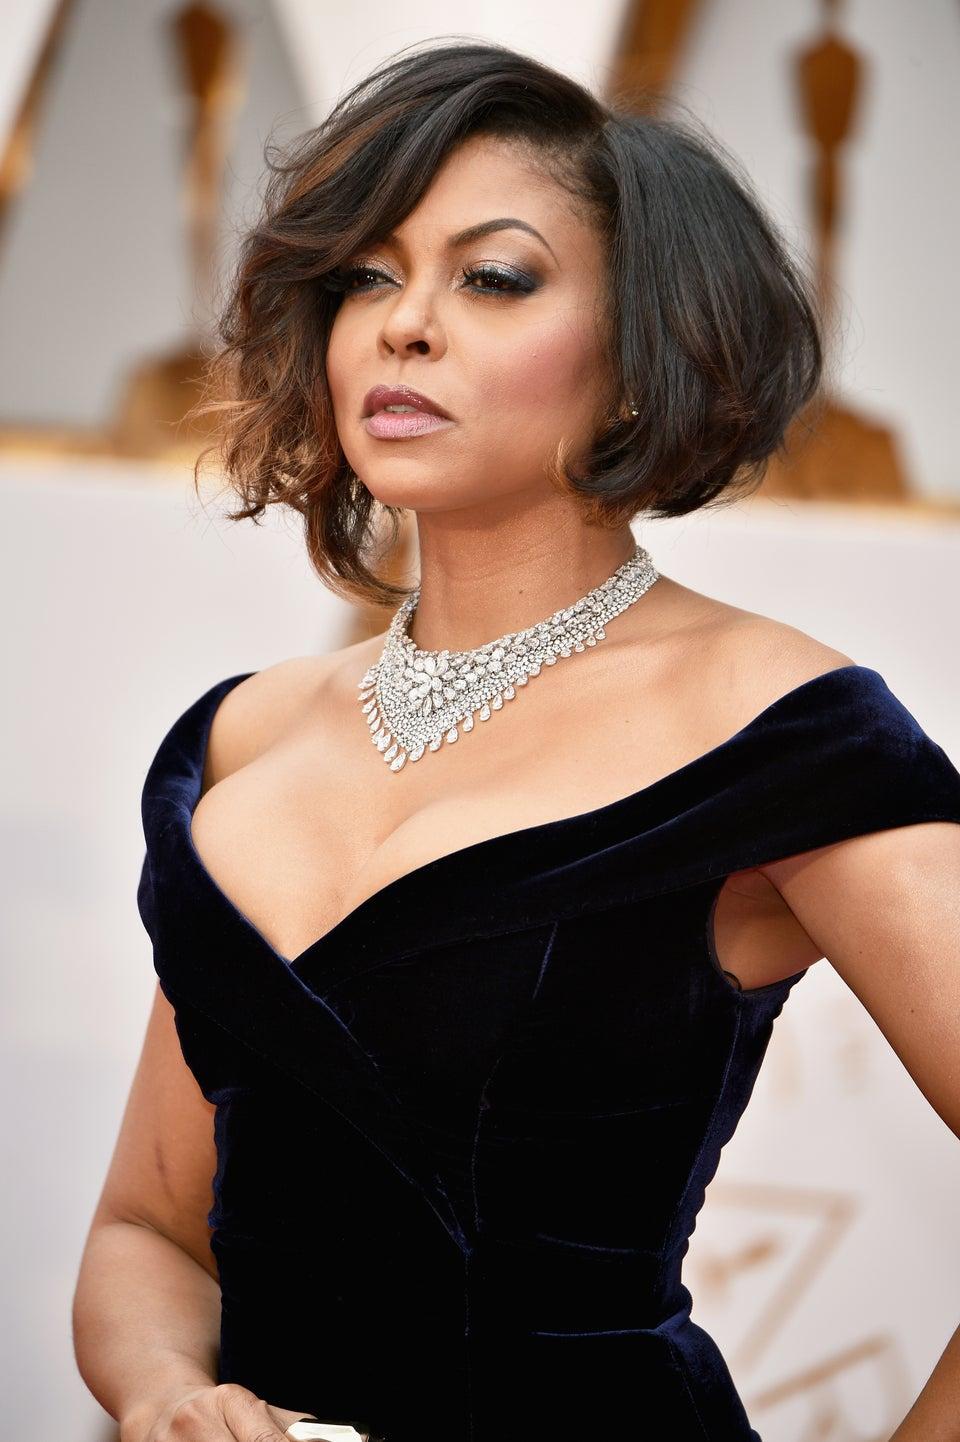 Taraji P. Henson's Tousled Bob Is Perfection At The 2017 Academy Awards